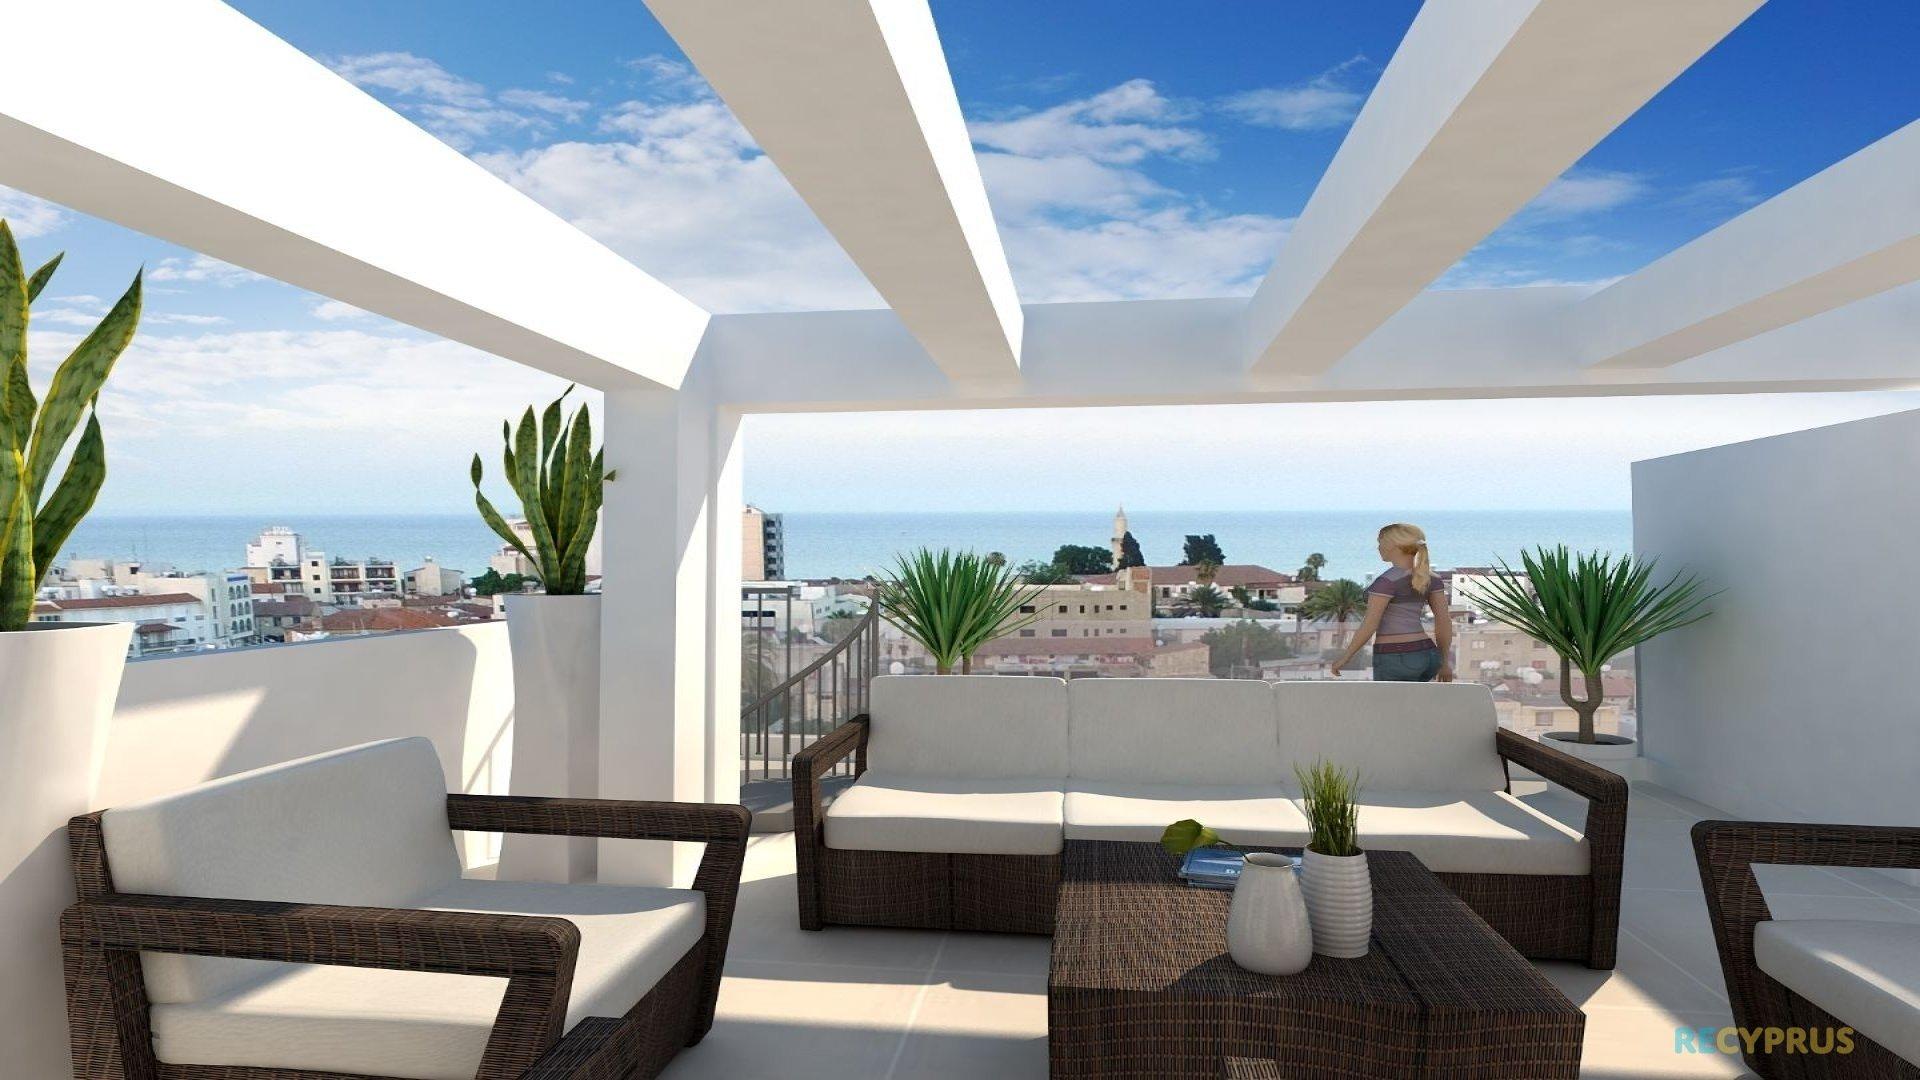 Apartment for sale City Center Larnaca Cyprus 9 3596